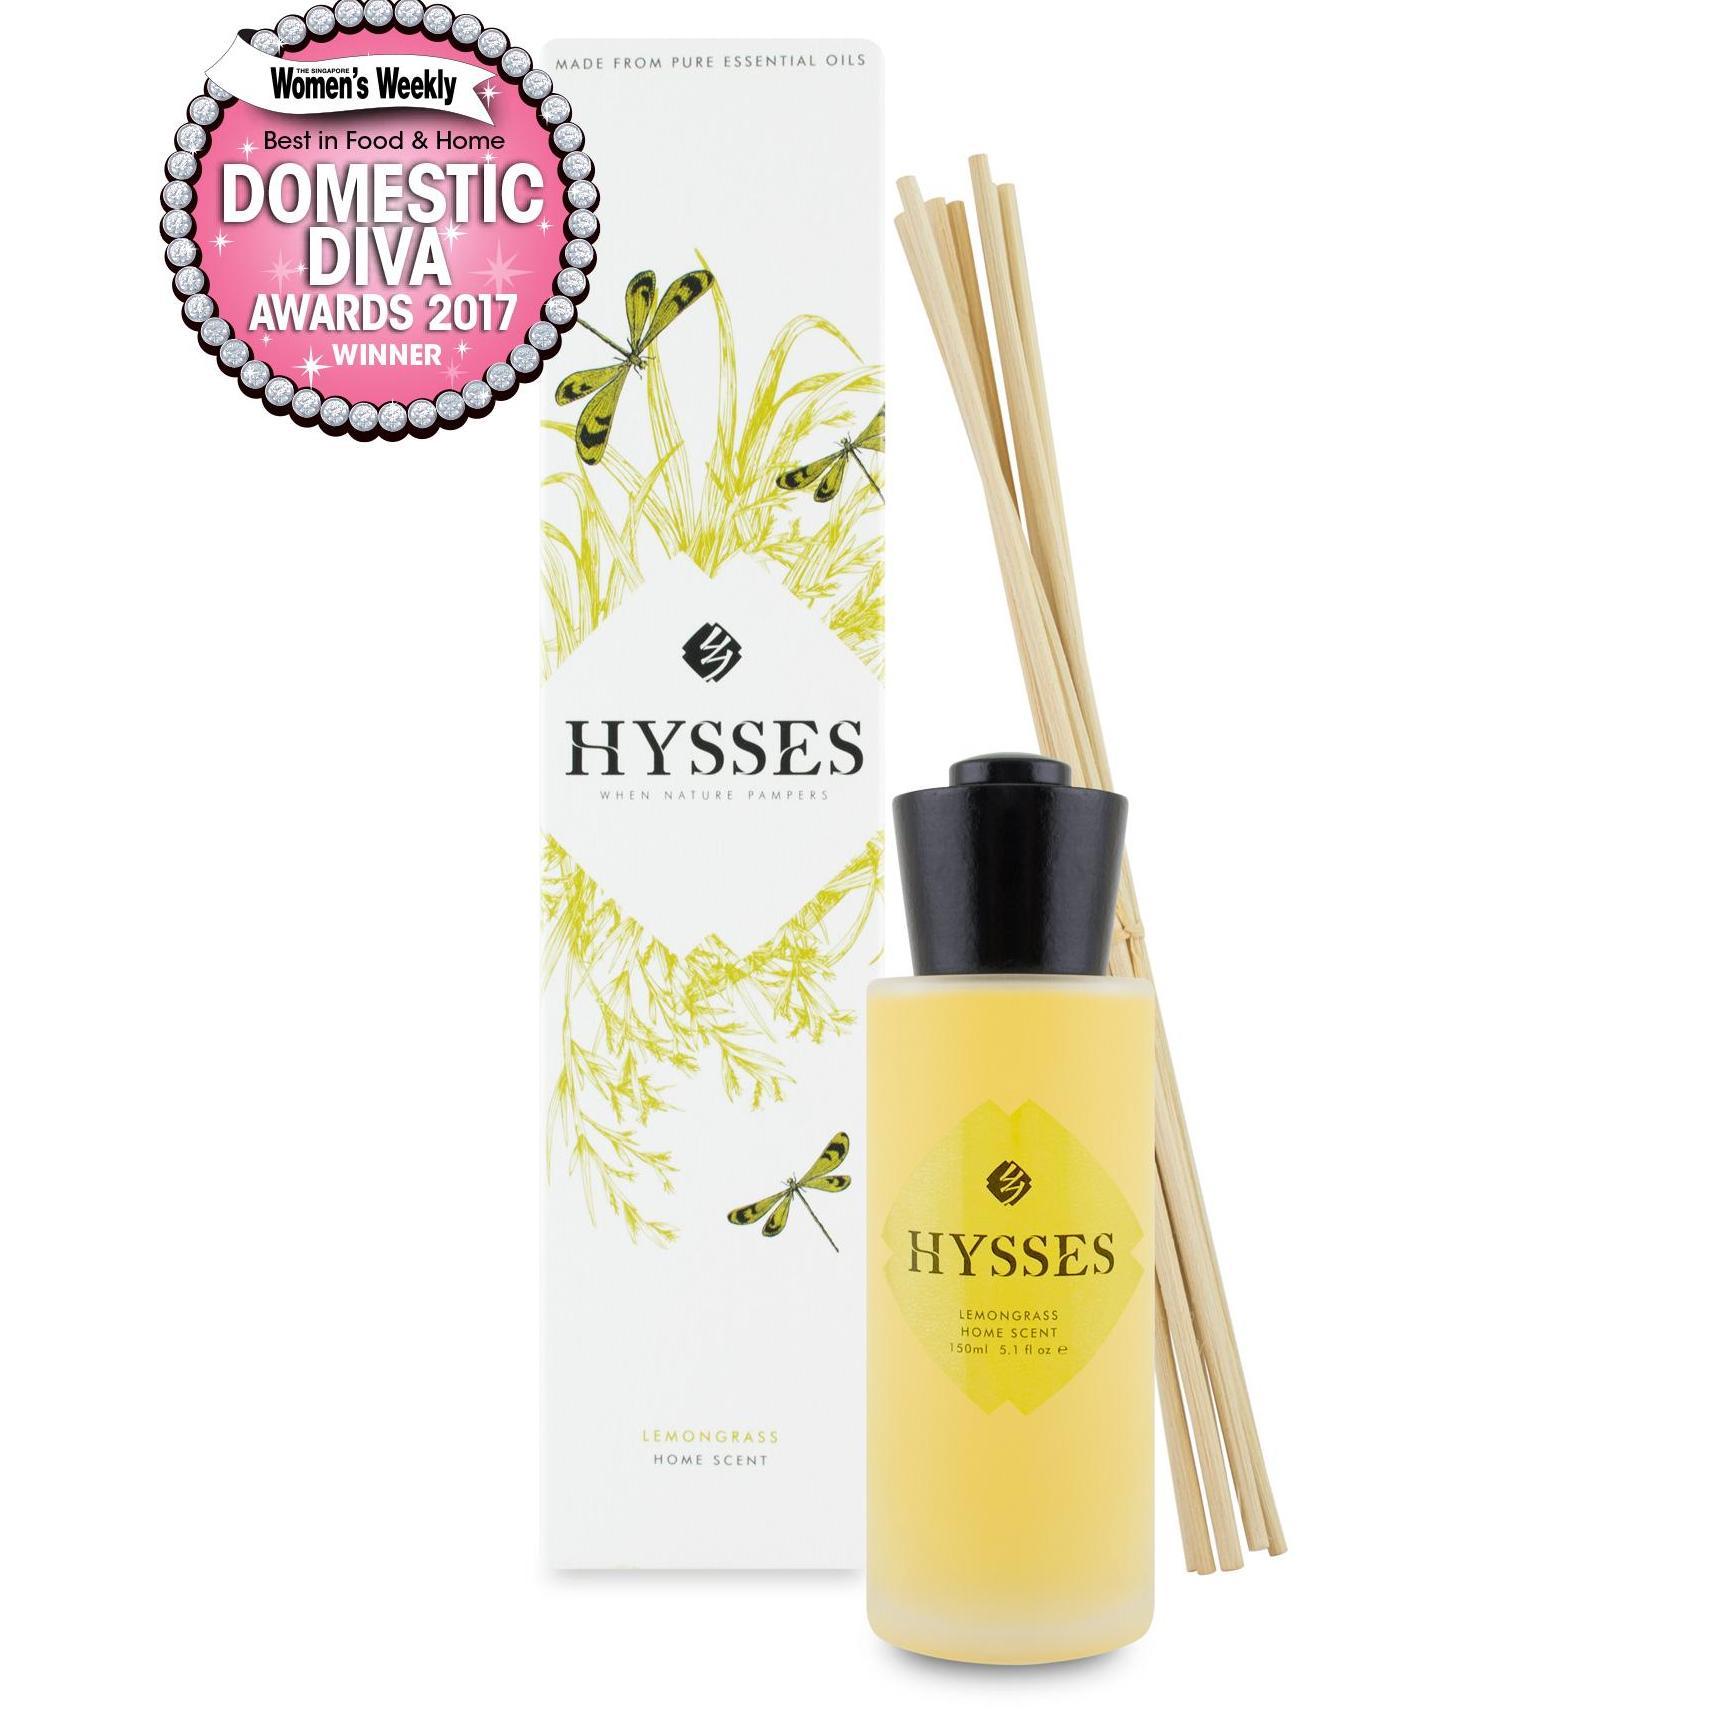 Hysses Lemongrass Home Scent